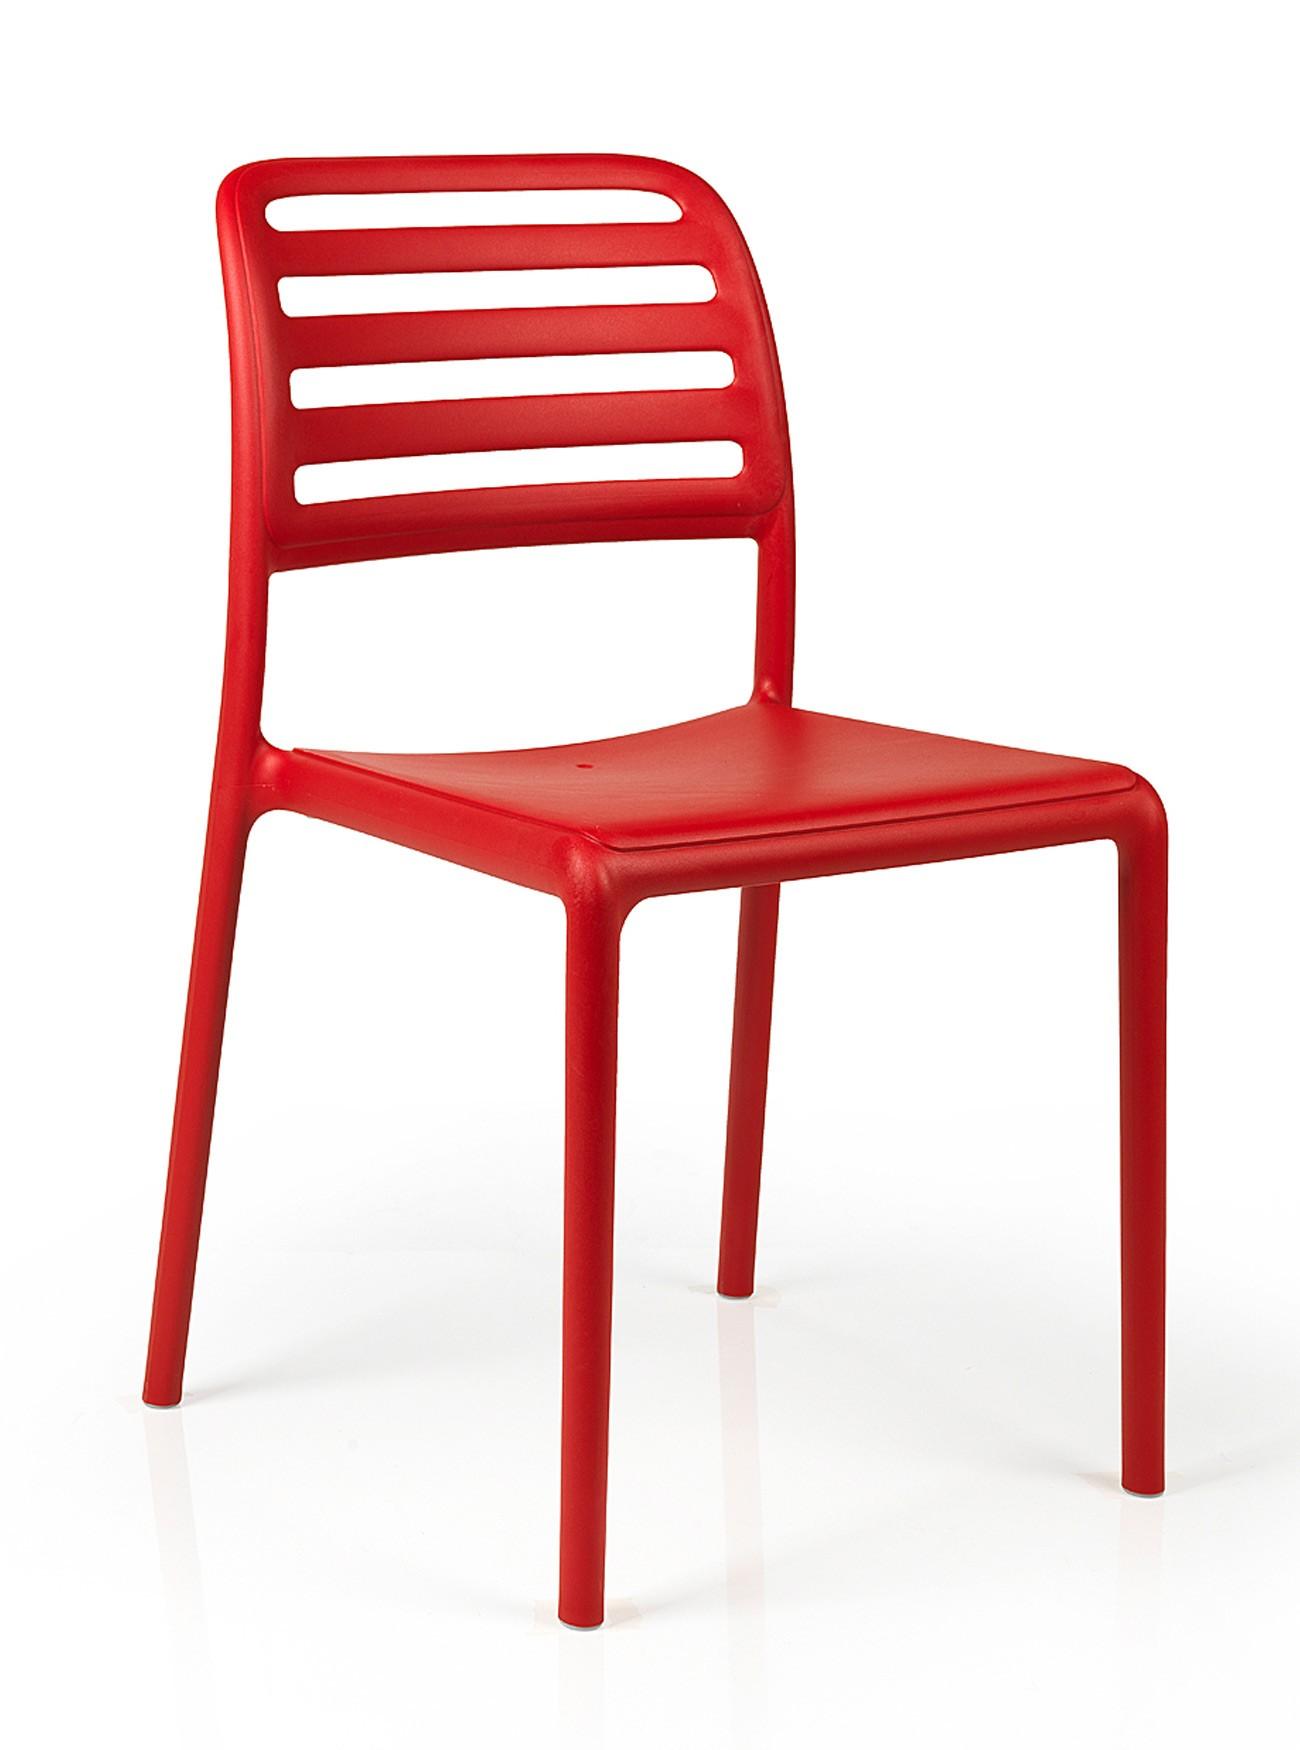 Nardi Stapelstuhl / Gartenstuhl Costa Bistrot Kunststoff rosso Bild 1